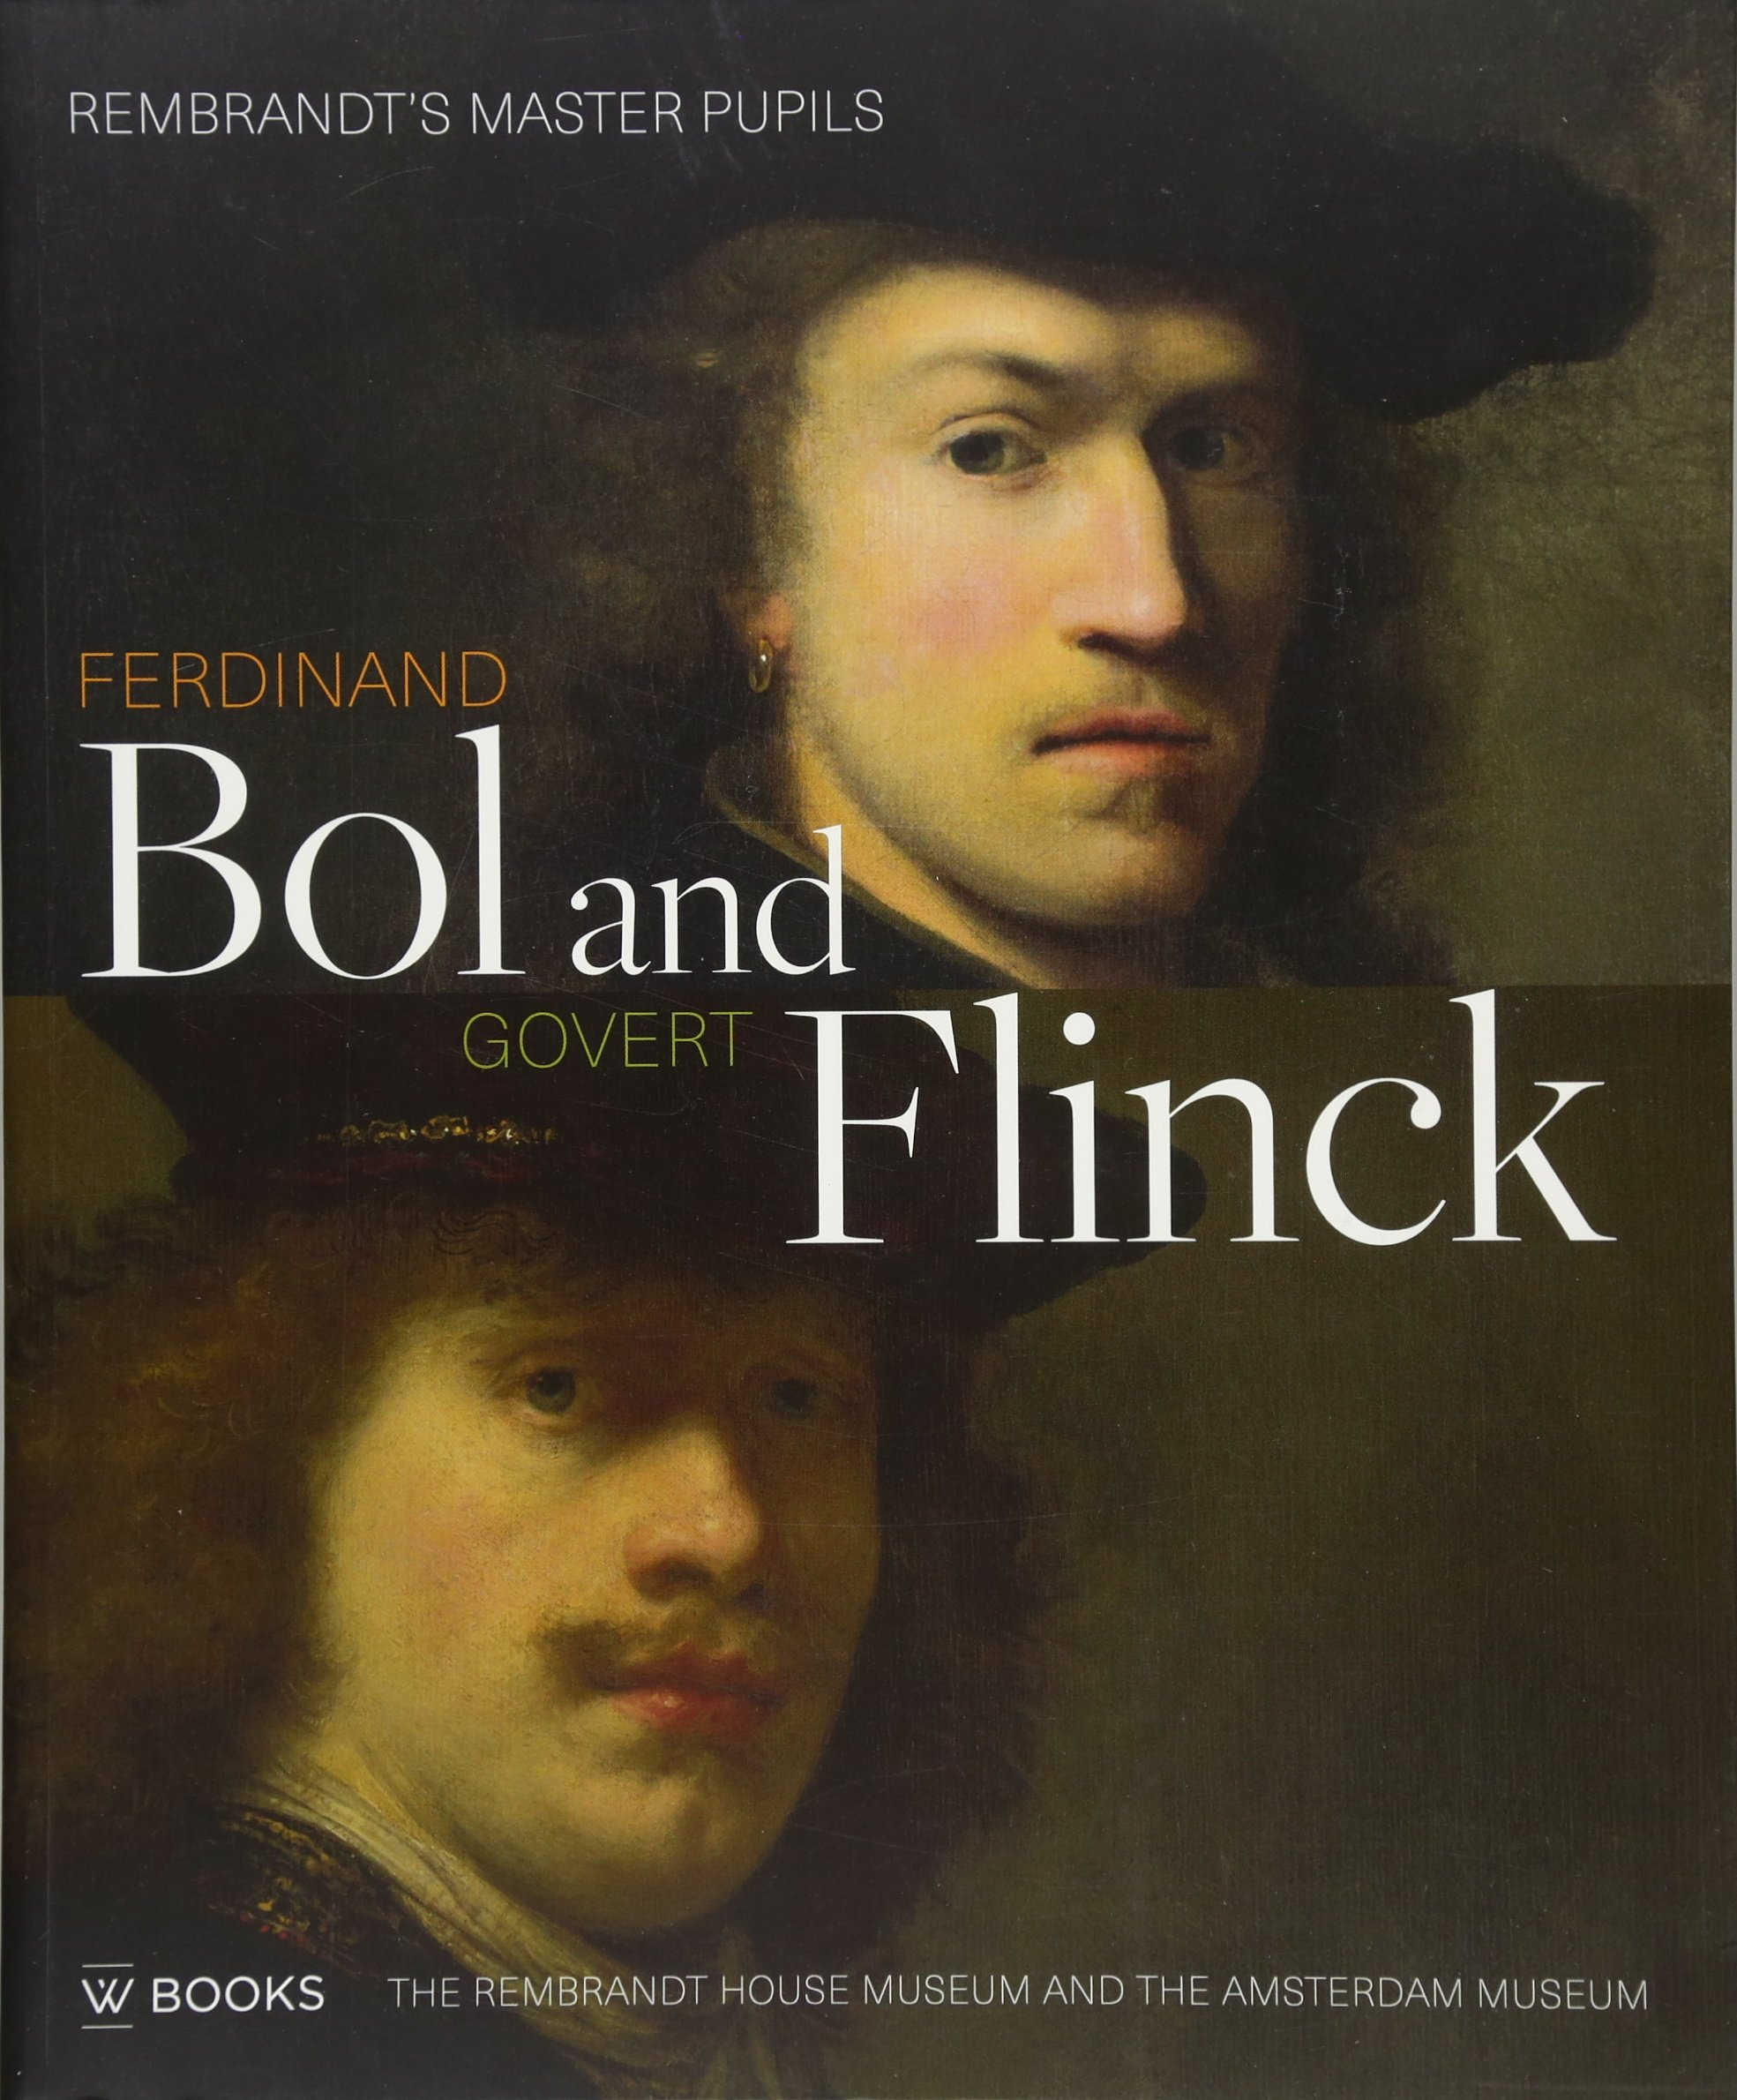 Download Ferdinand Bol and Govert Flinck: Rembrandt's Master Pupils pdf epub